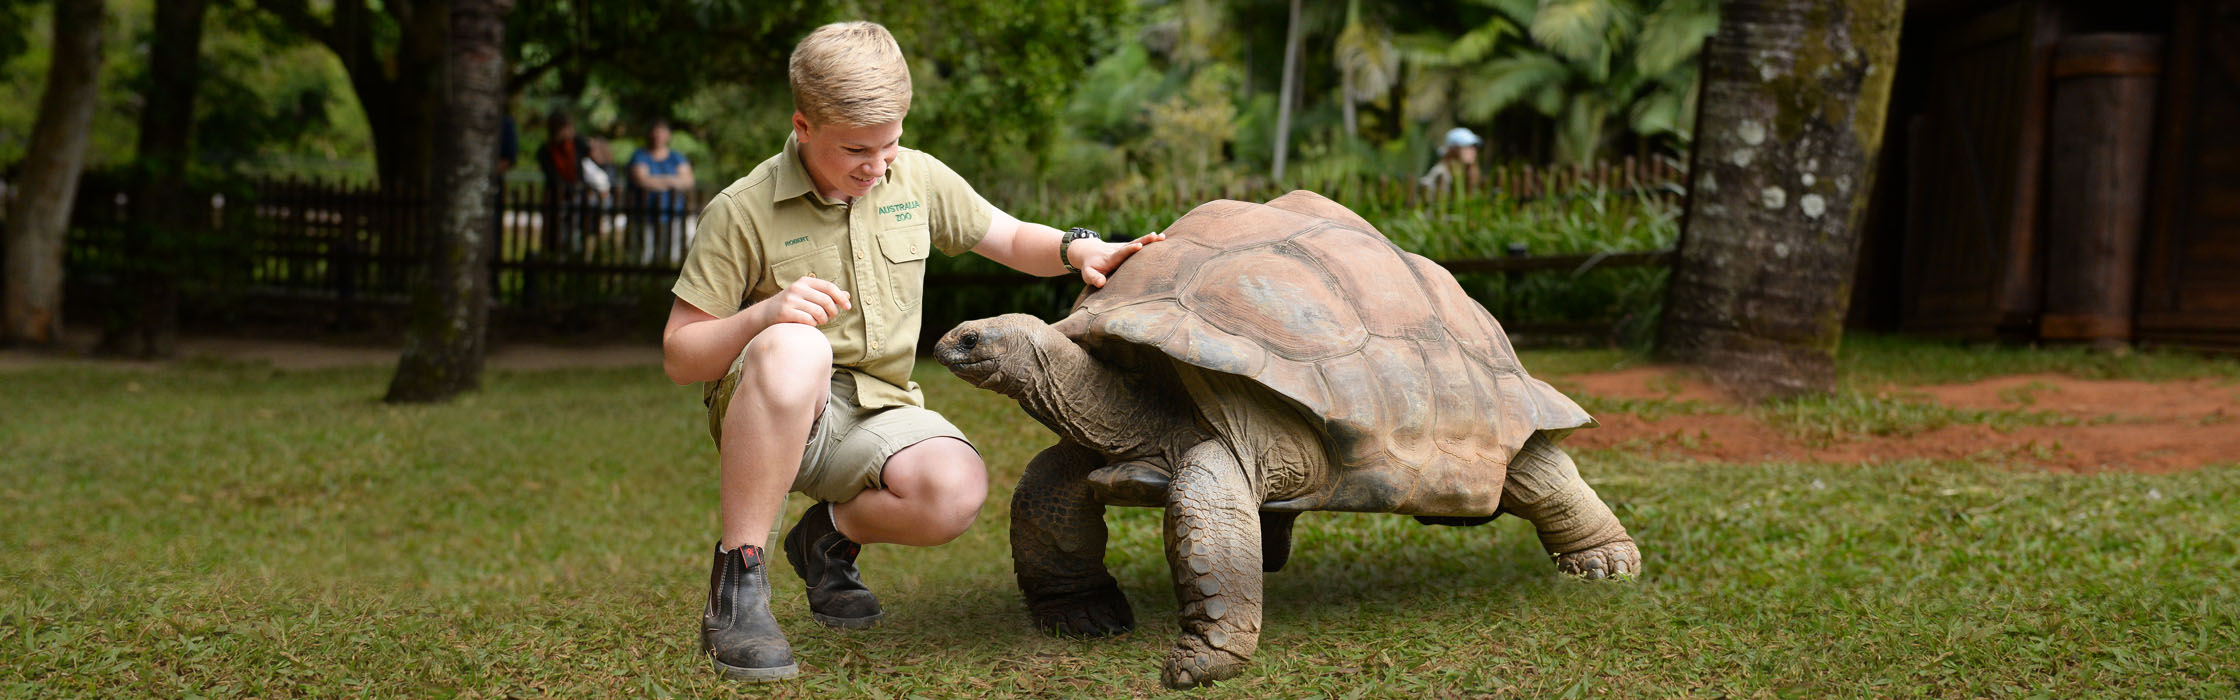 Experiences-Animal Encounters-Totally Tortoise Encounter2240x700